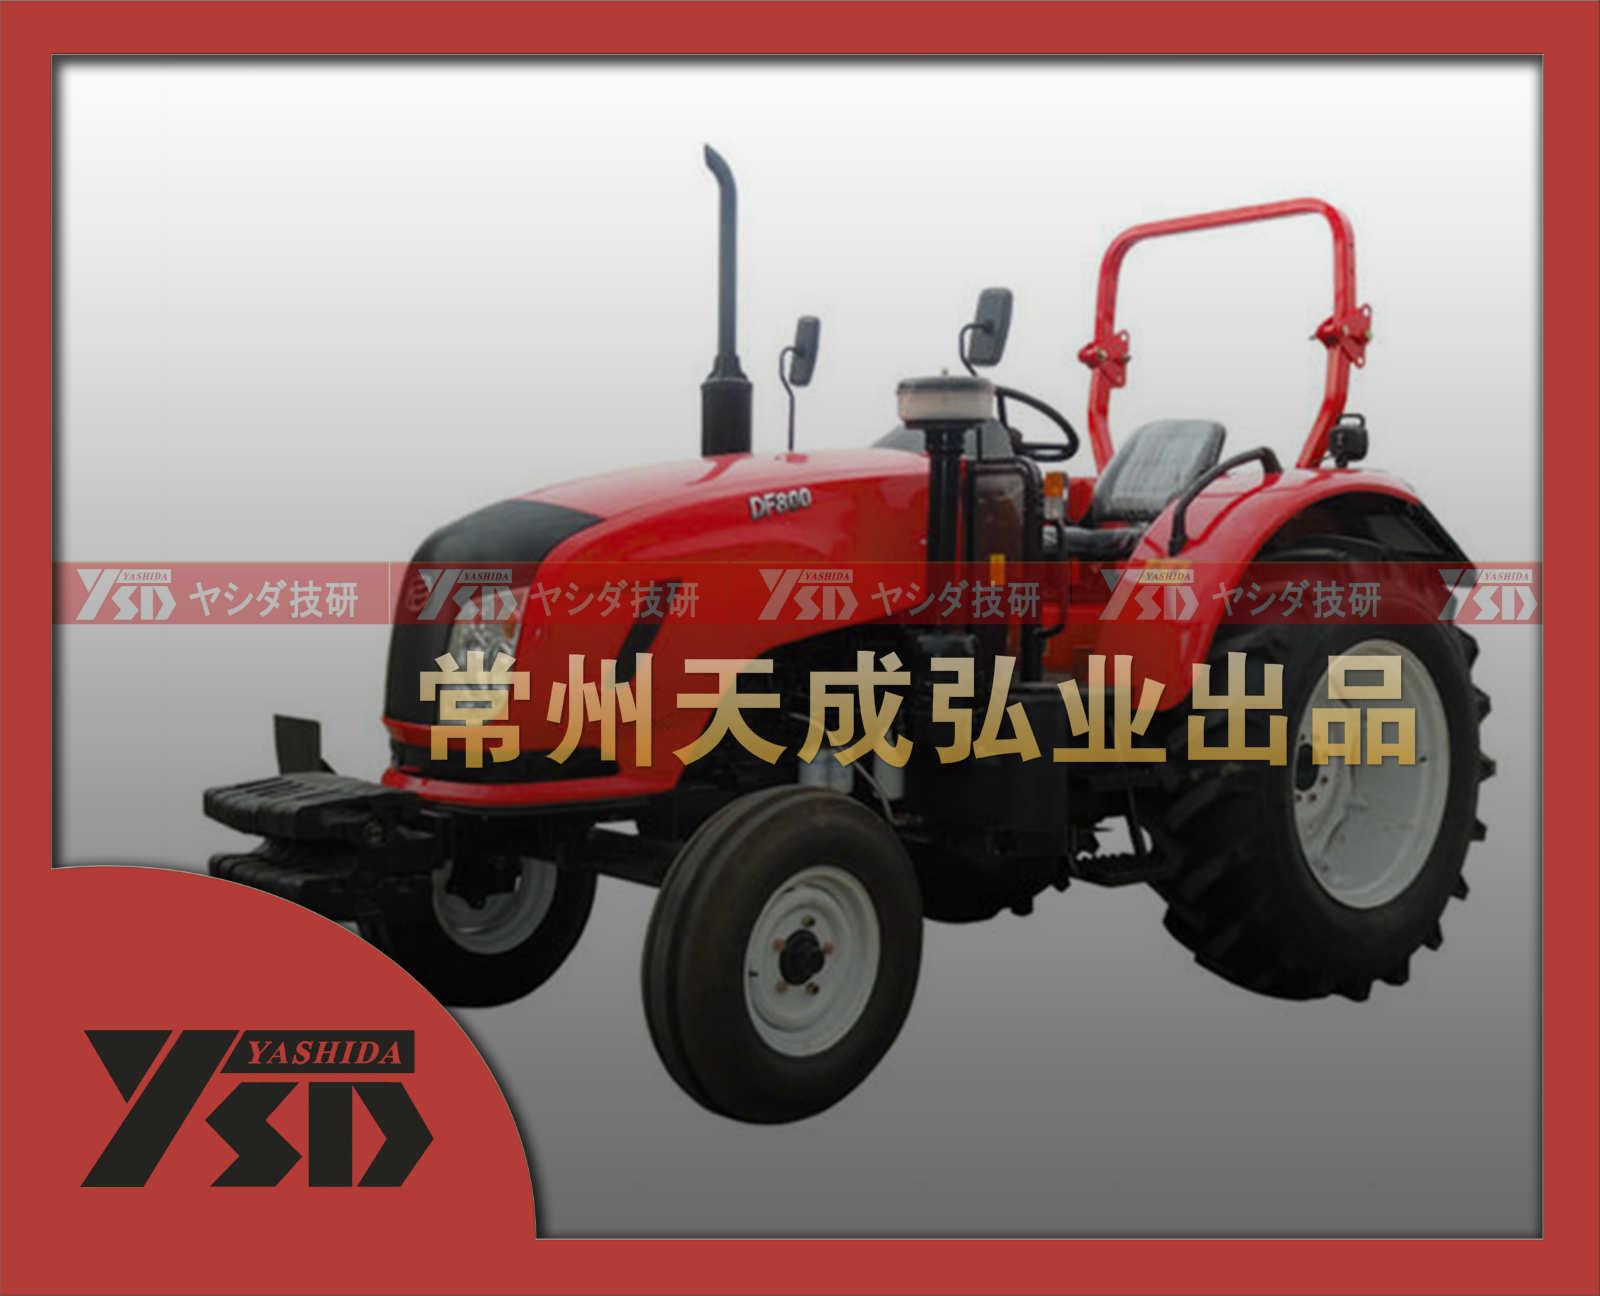 DF800/DF804 80马力 东风型四轮拖拉机 常州制造 厂价直销